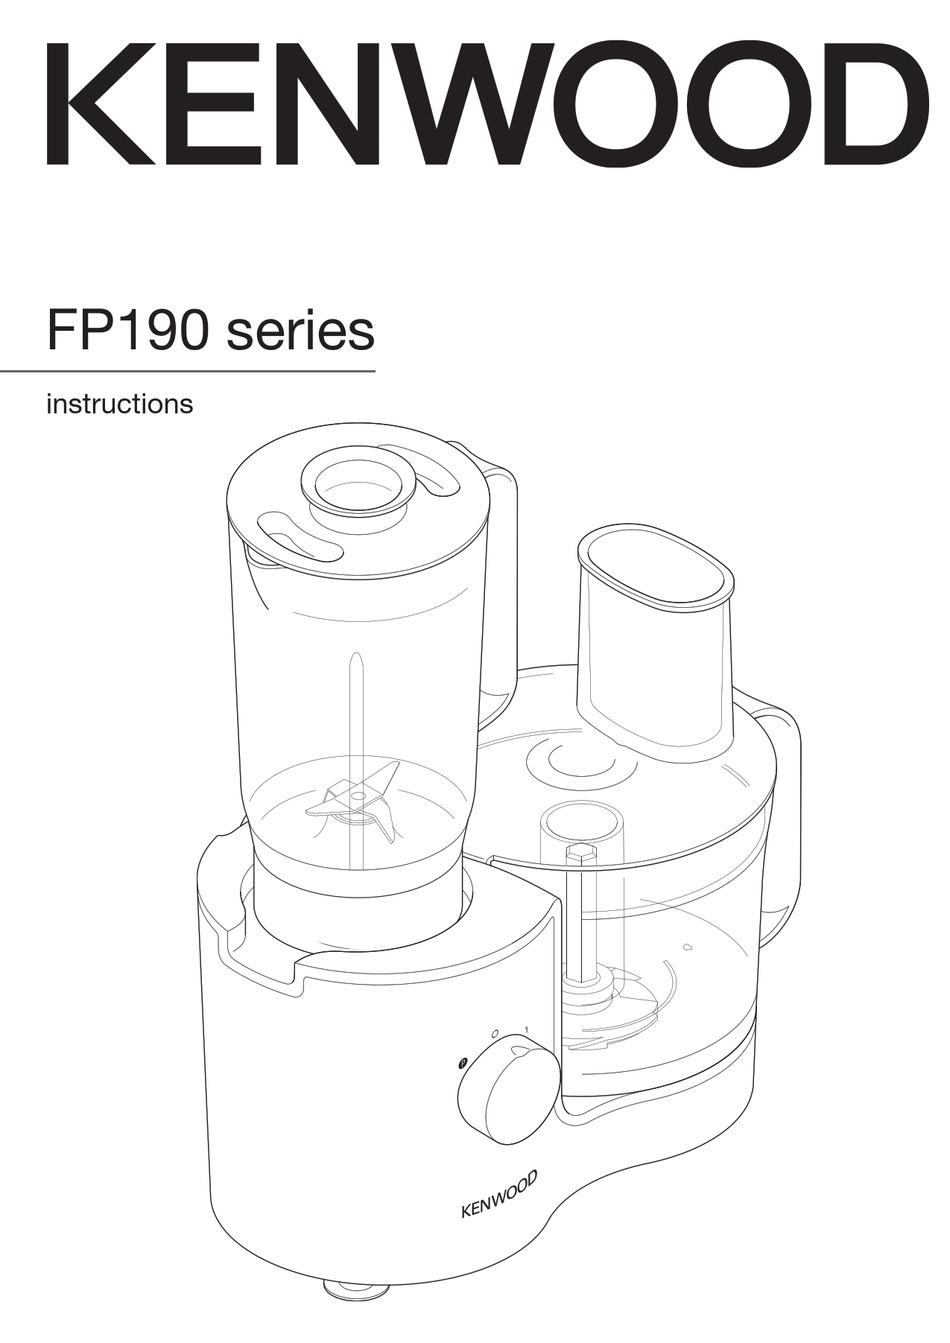 KENWOOD FP190 SERIES INSTRUCTIONS MANUAL Pdf Download